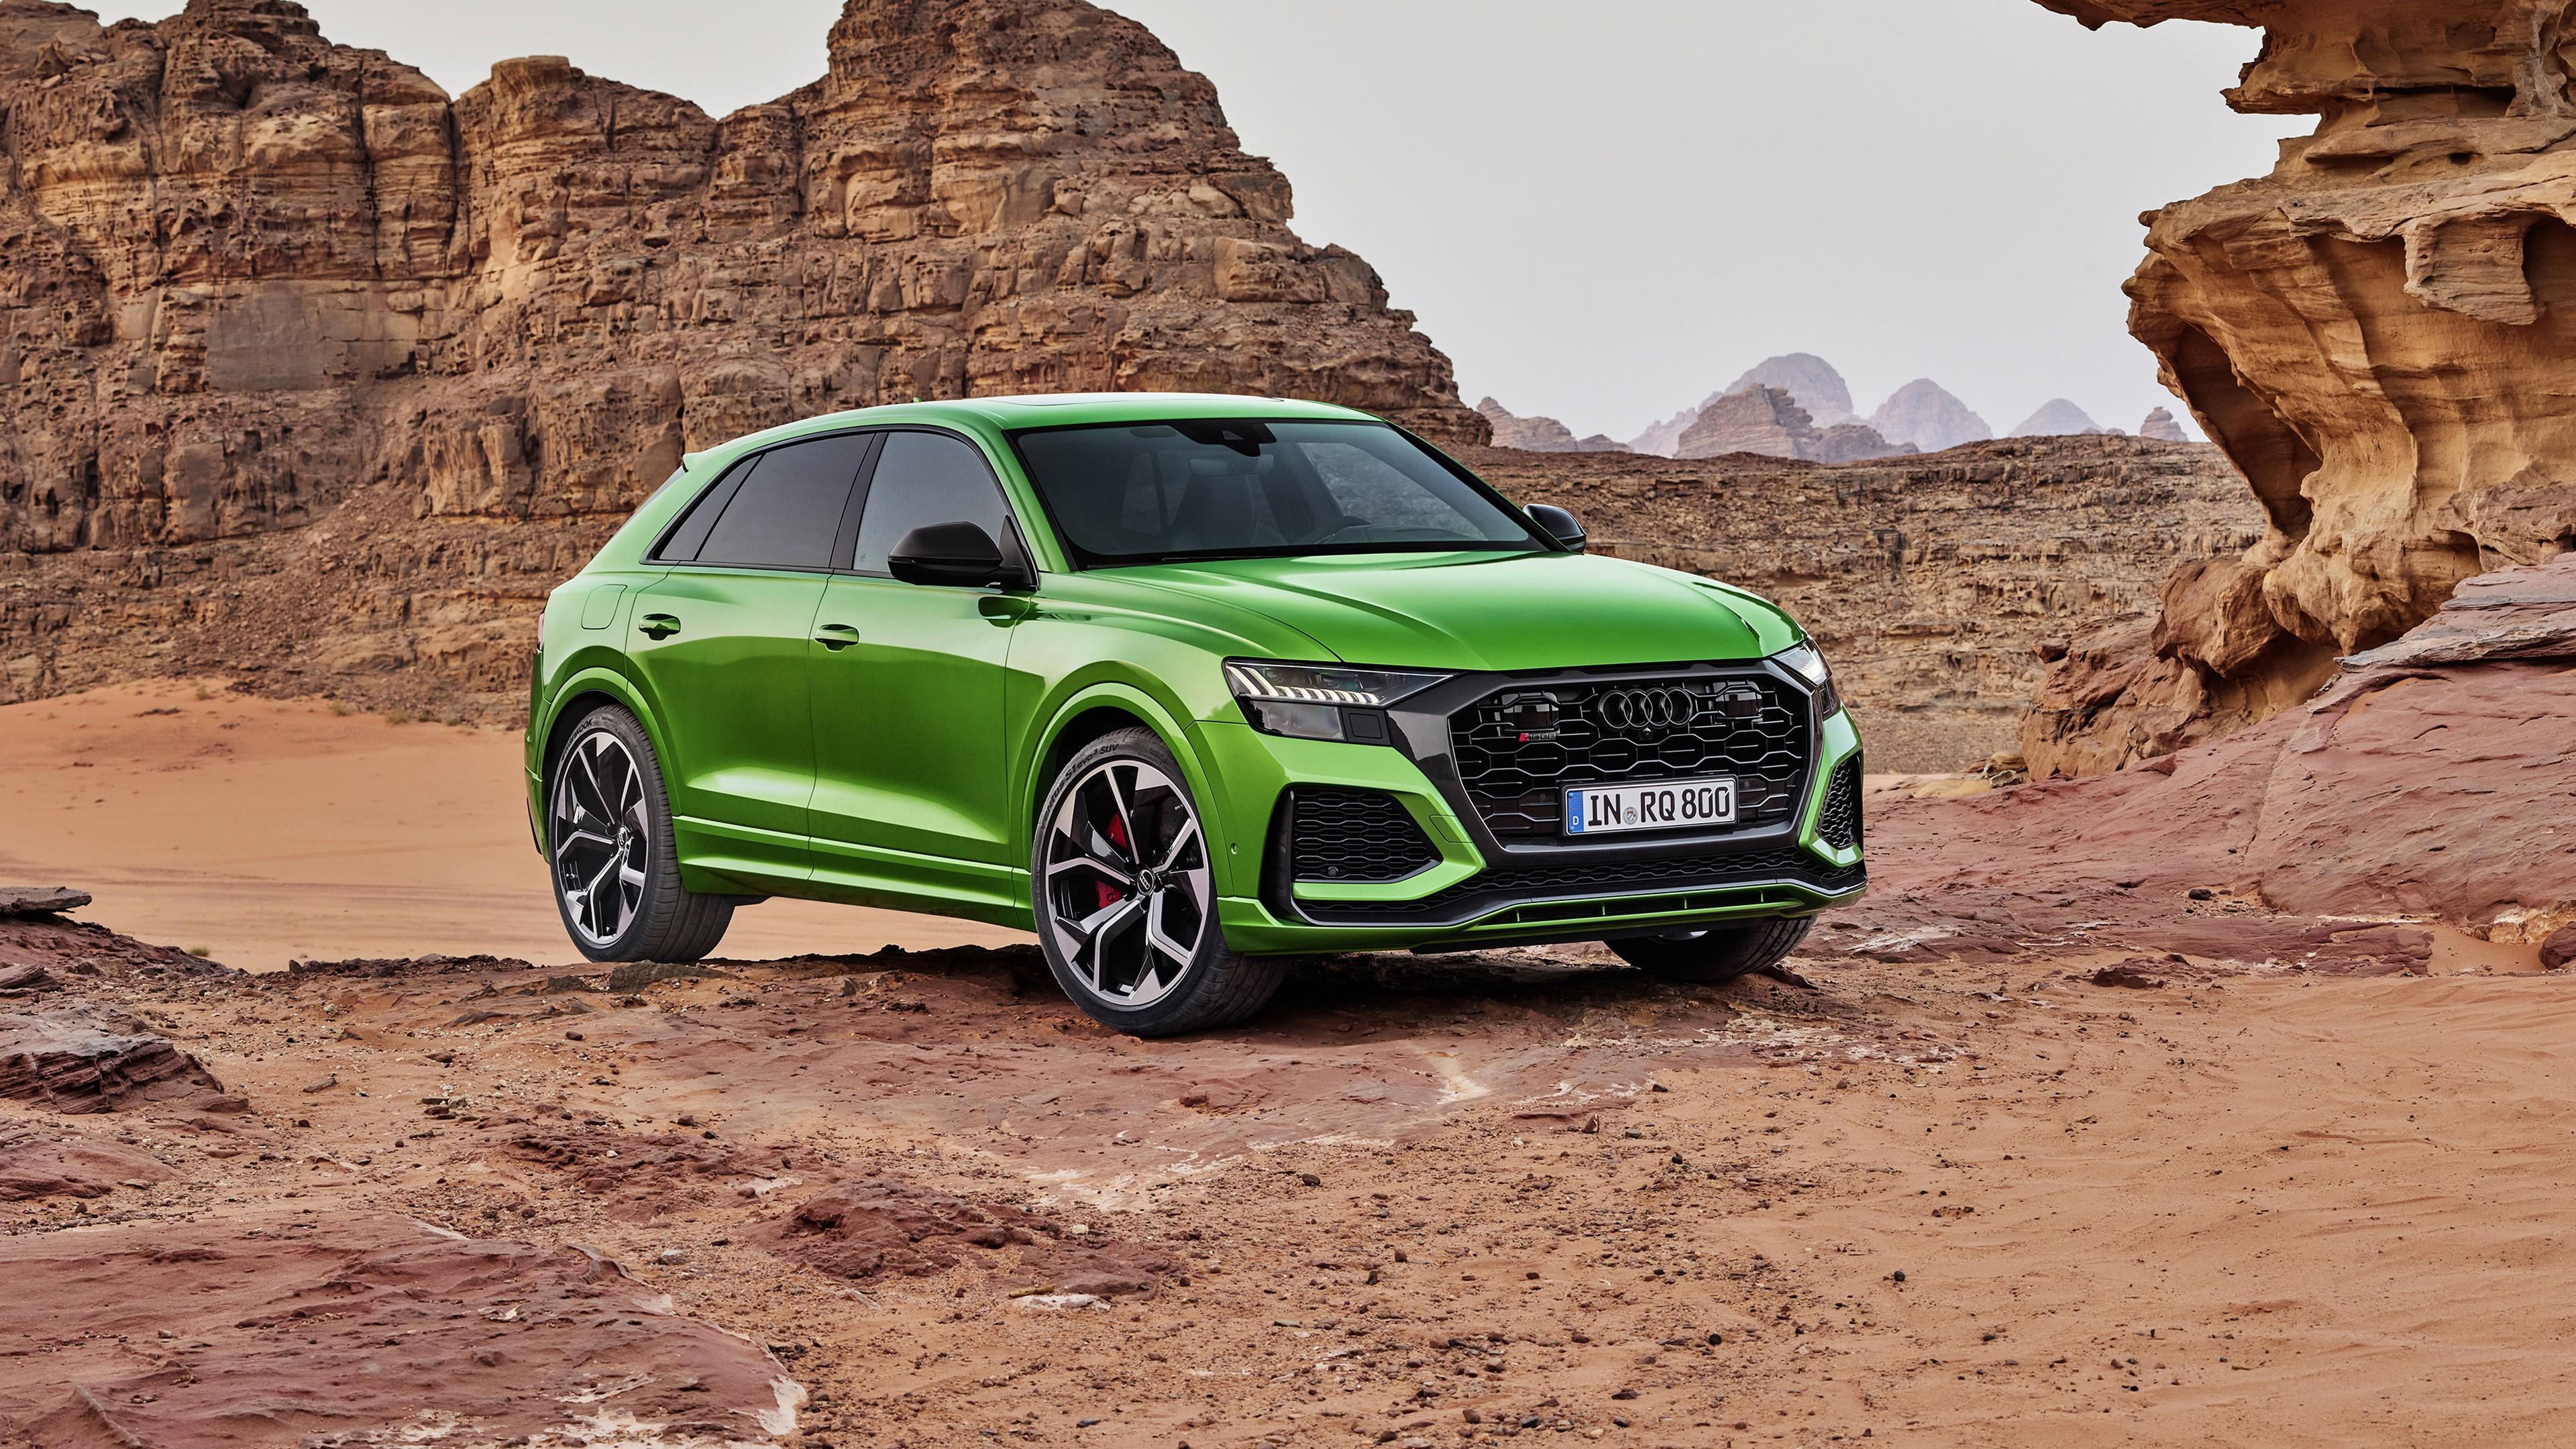 Audi RS Q8 2020 4K 5 Wallpaper | HD Car Wallpapers | ID #13719